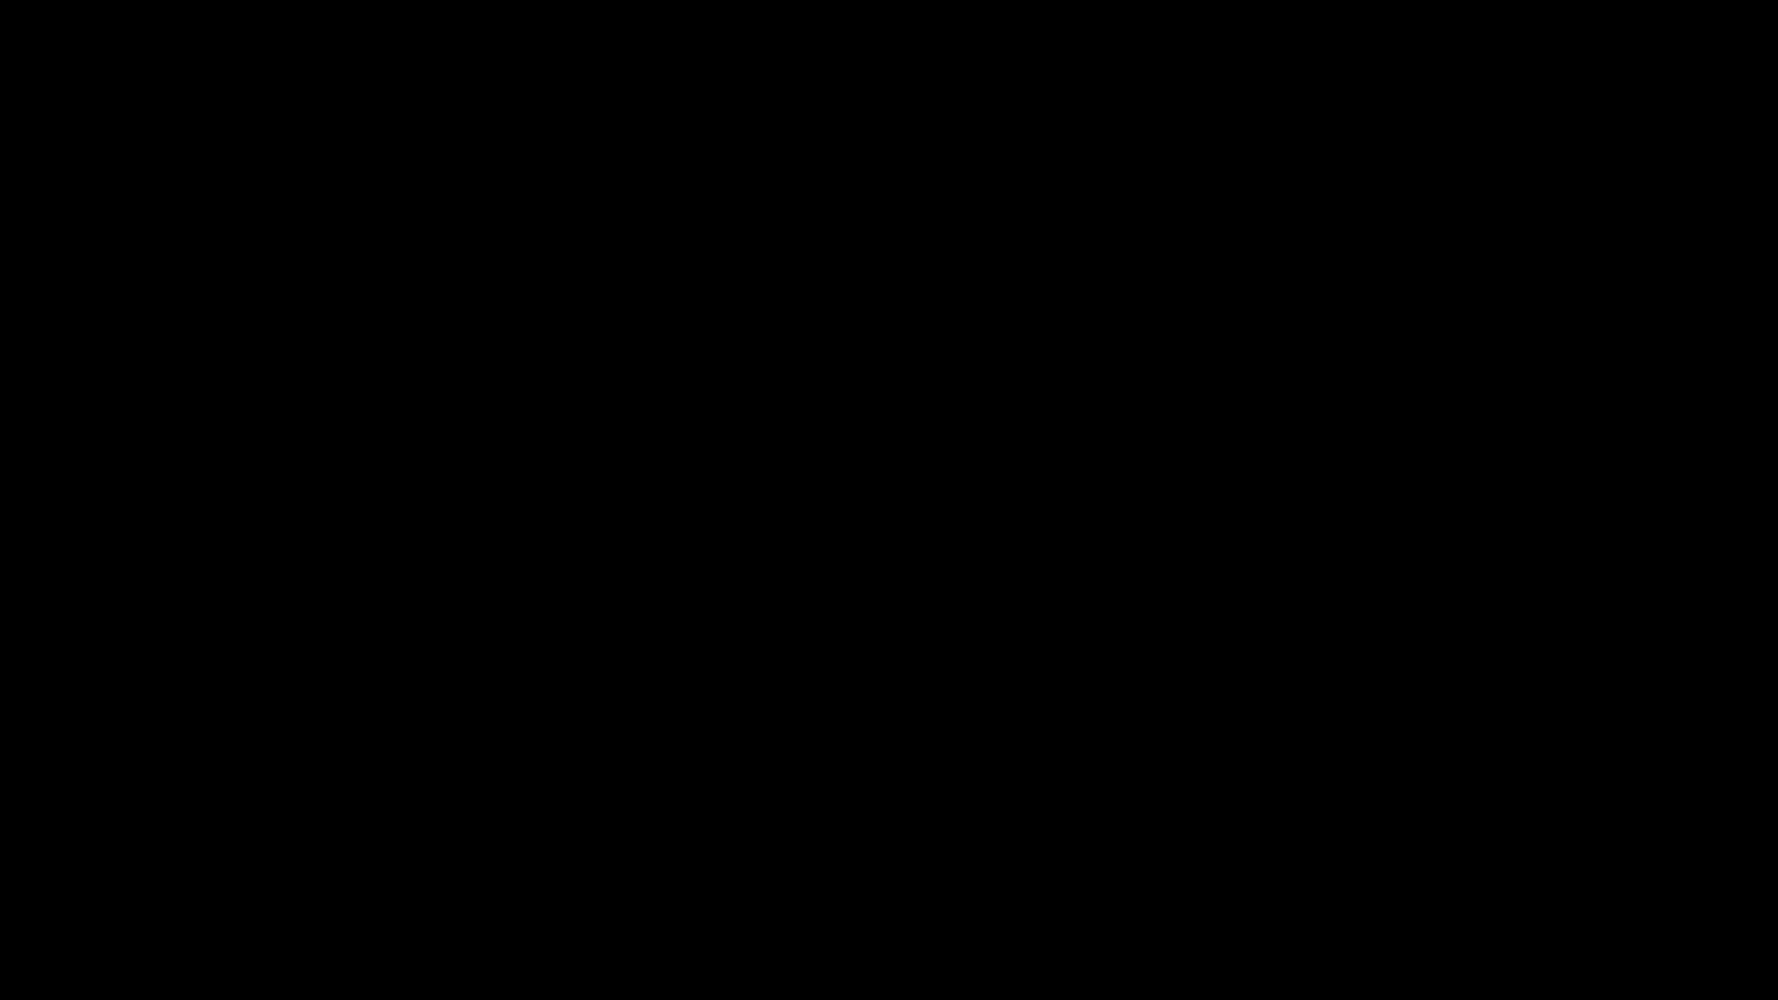 4023_m-44